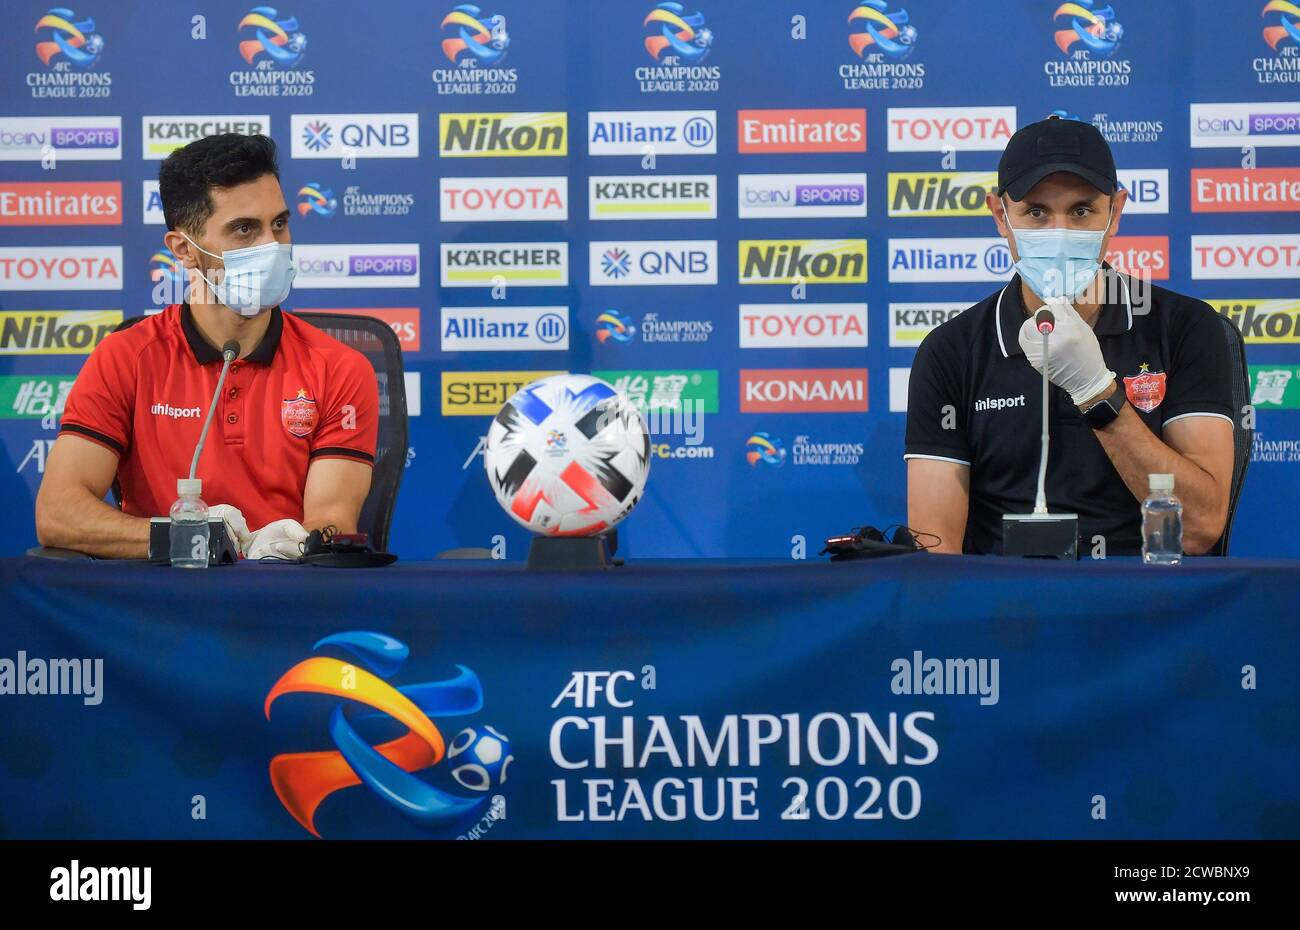 Doha Qatar 29th Sep 2020 Persepolis Fc Head Coach Yahya Golmohammadi R And Player Omid Ali